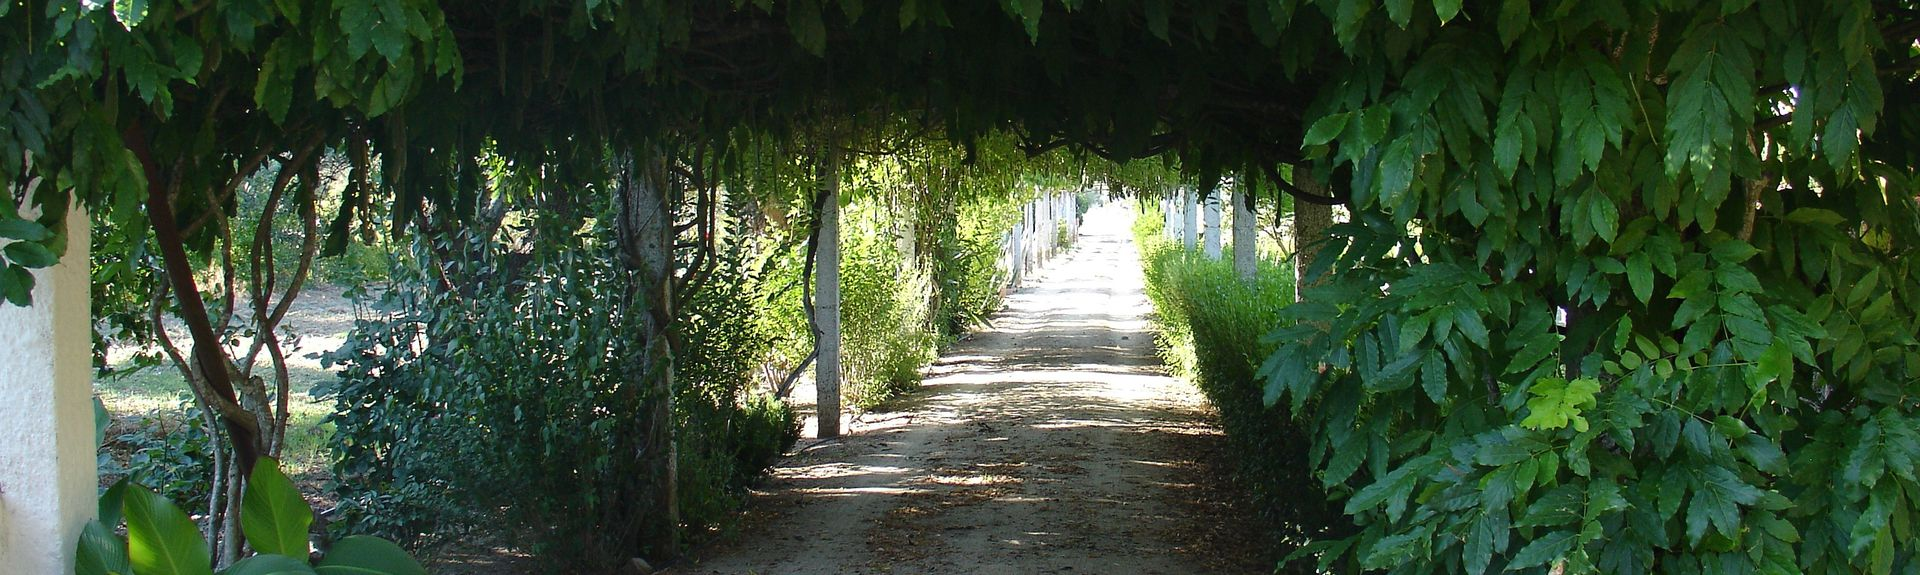 Bejan piiri, Portugali